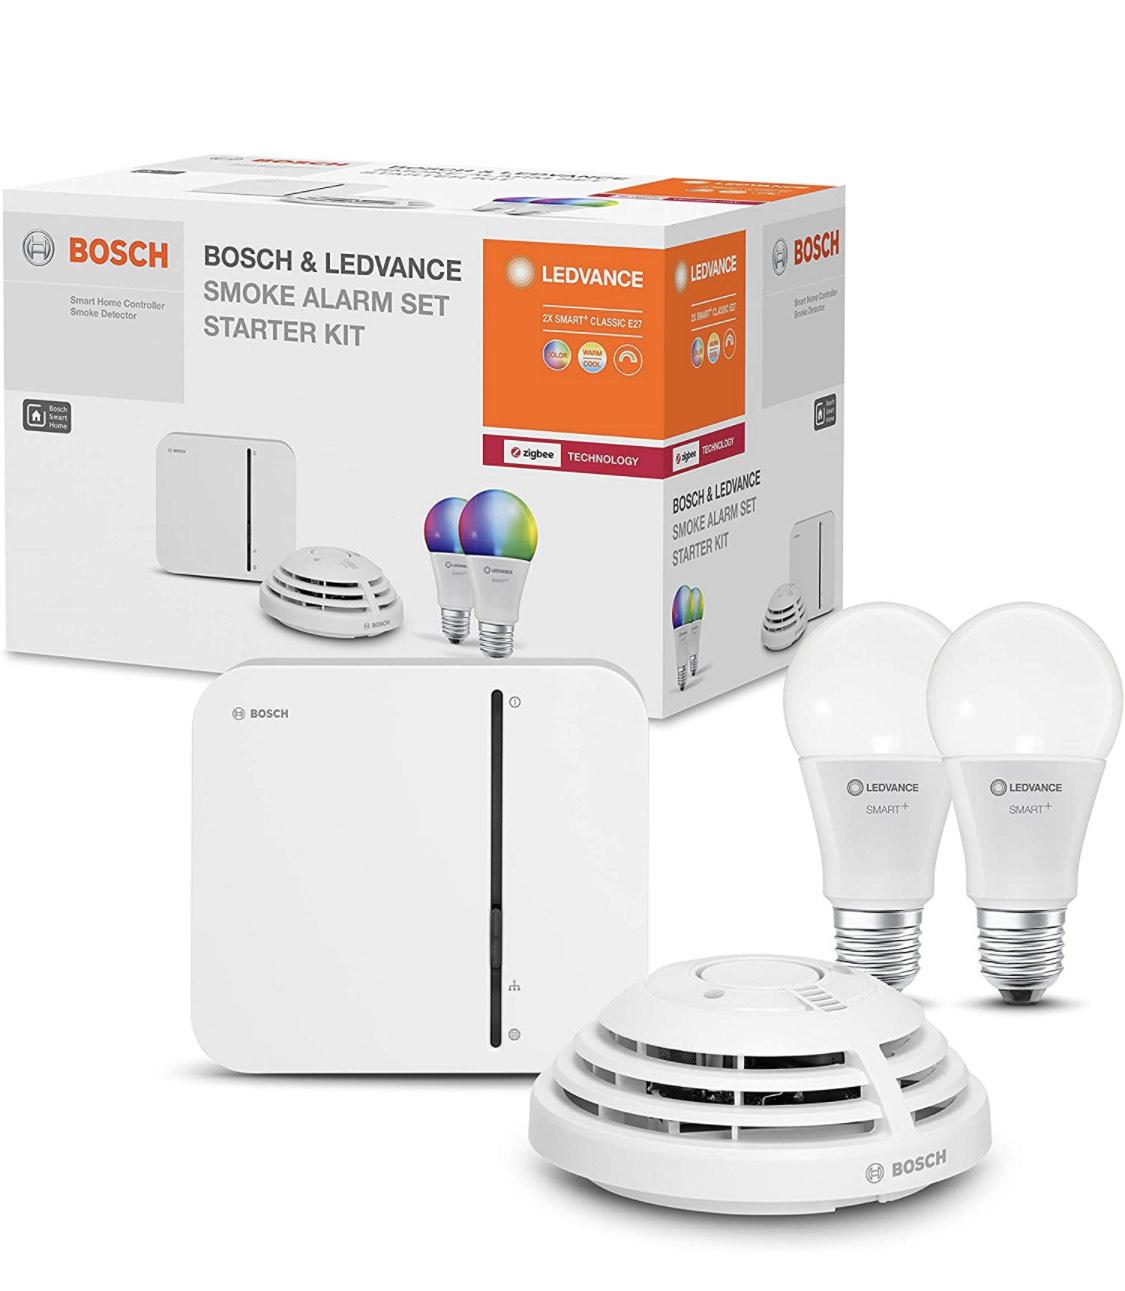 LEDVANCE & BOSCH Smart Home Smoke Alarm Set (Starter-Kit) £43.77 delivered @ Amazon